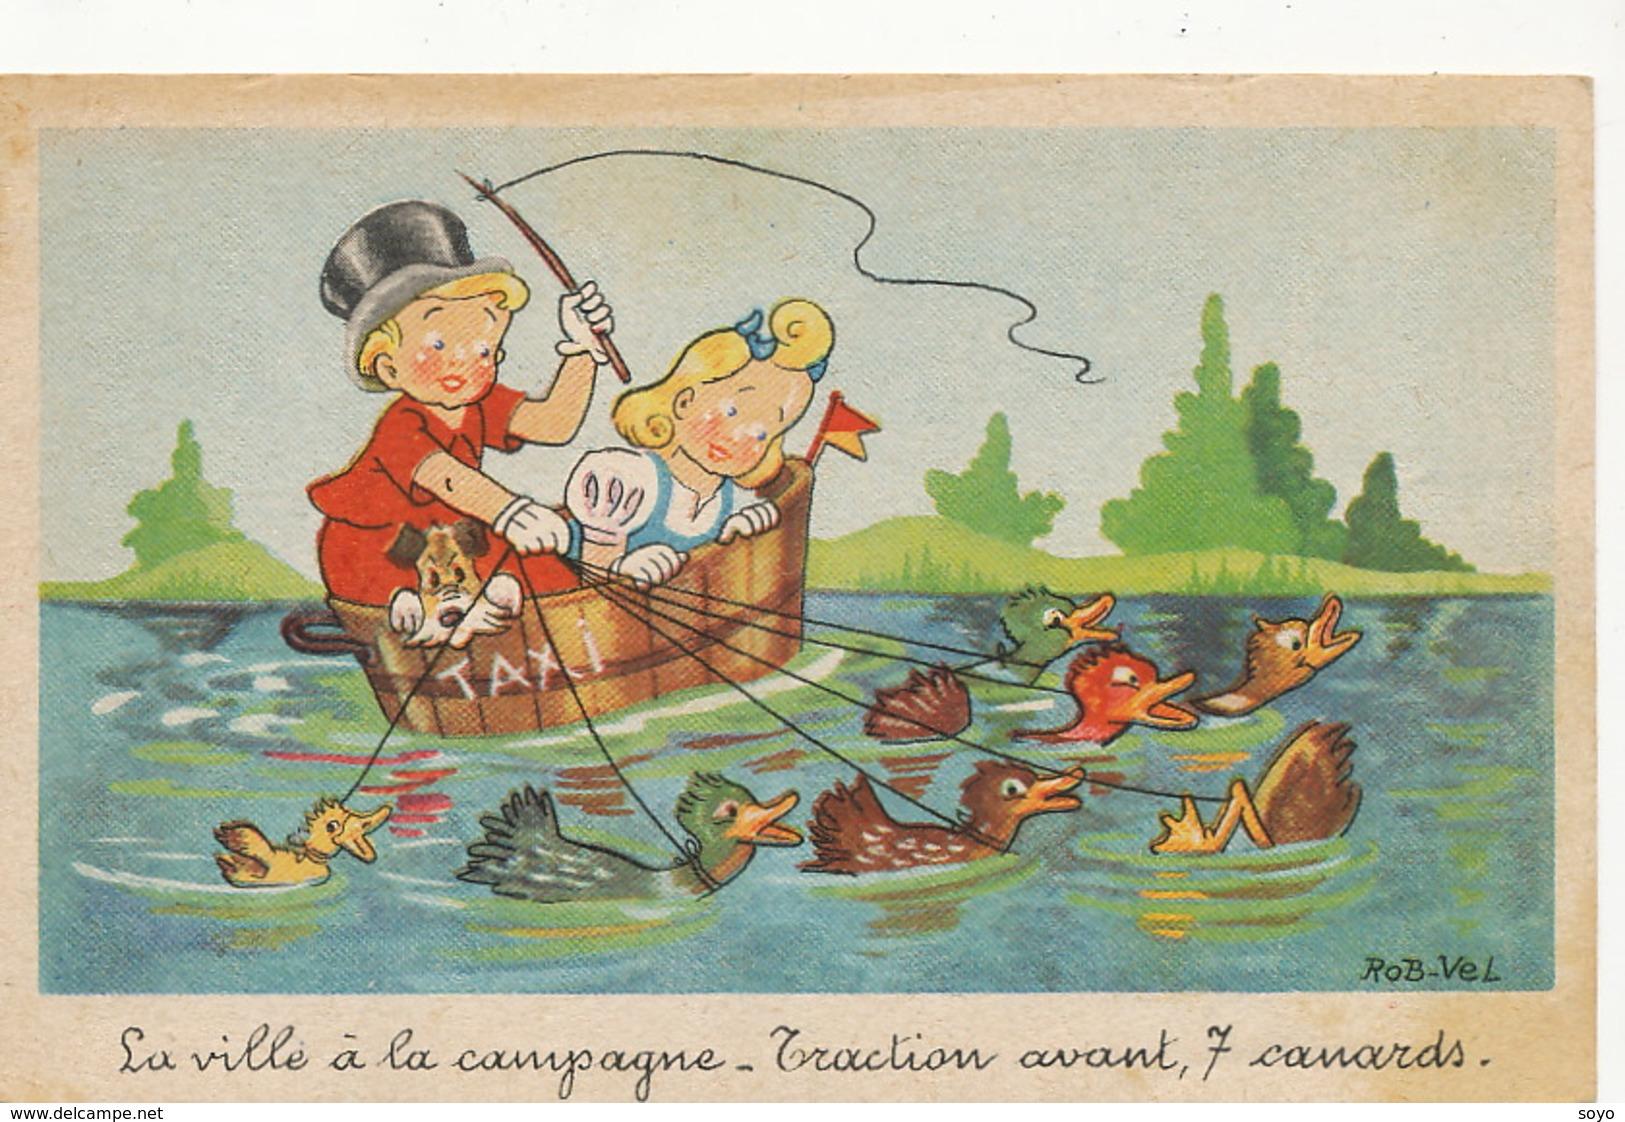 Humour Traction Avant 7 Canards Taxi Par Rob Vel - Taxi & Carrozzelle